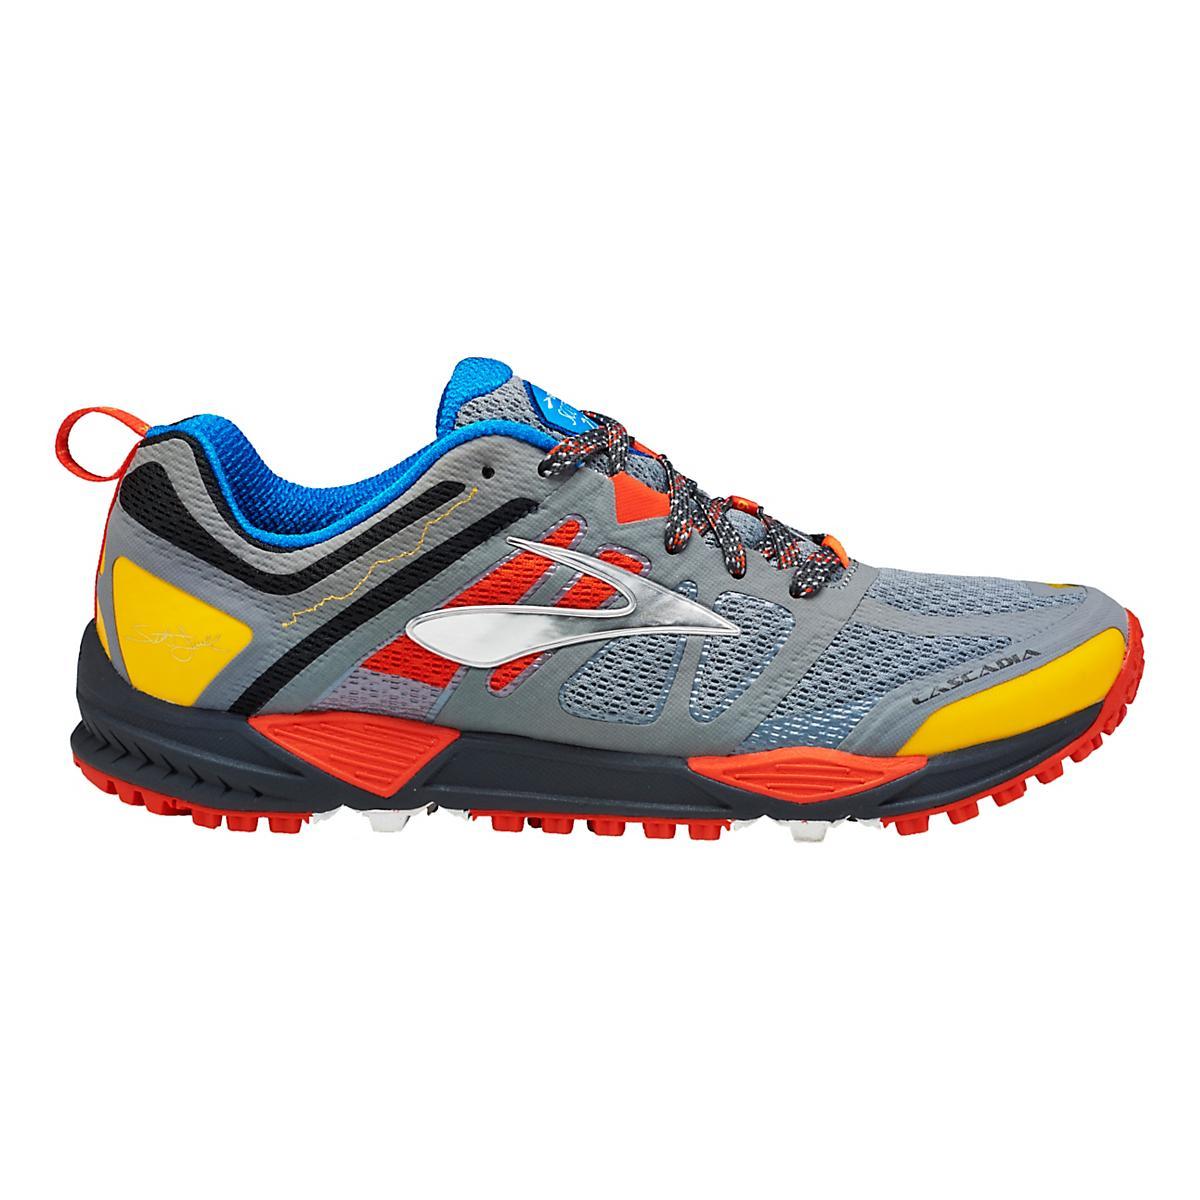 487c1a2e5c2 Mens Brooks Cascadia 2189 Trail Running Shoe at Road Runner Sports